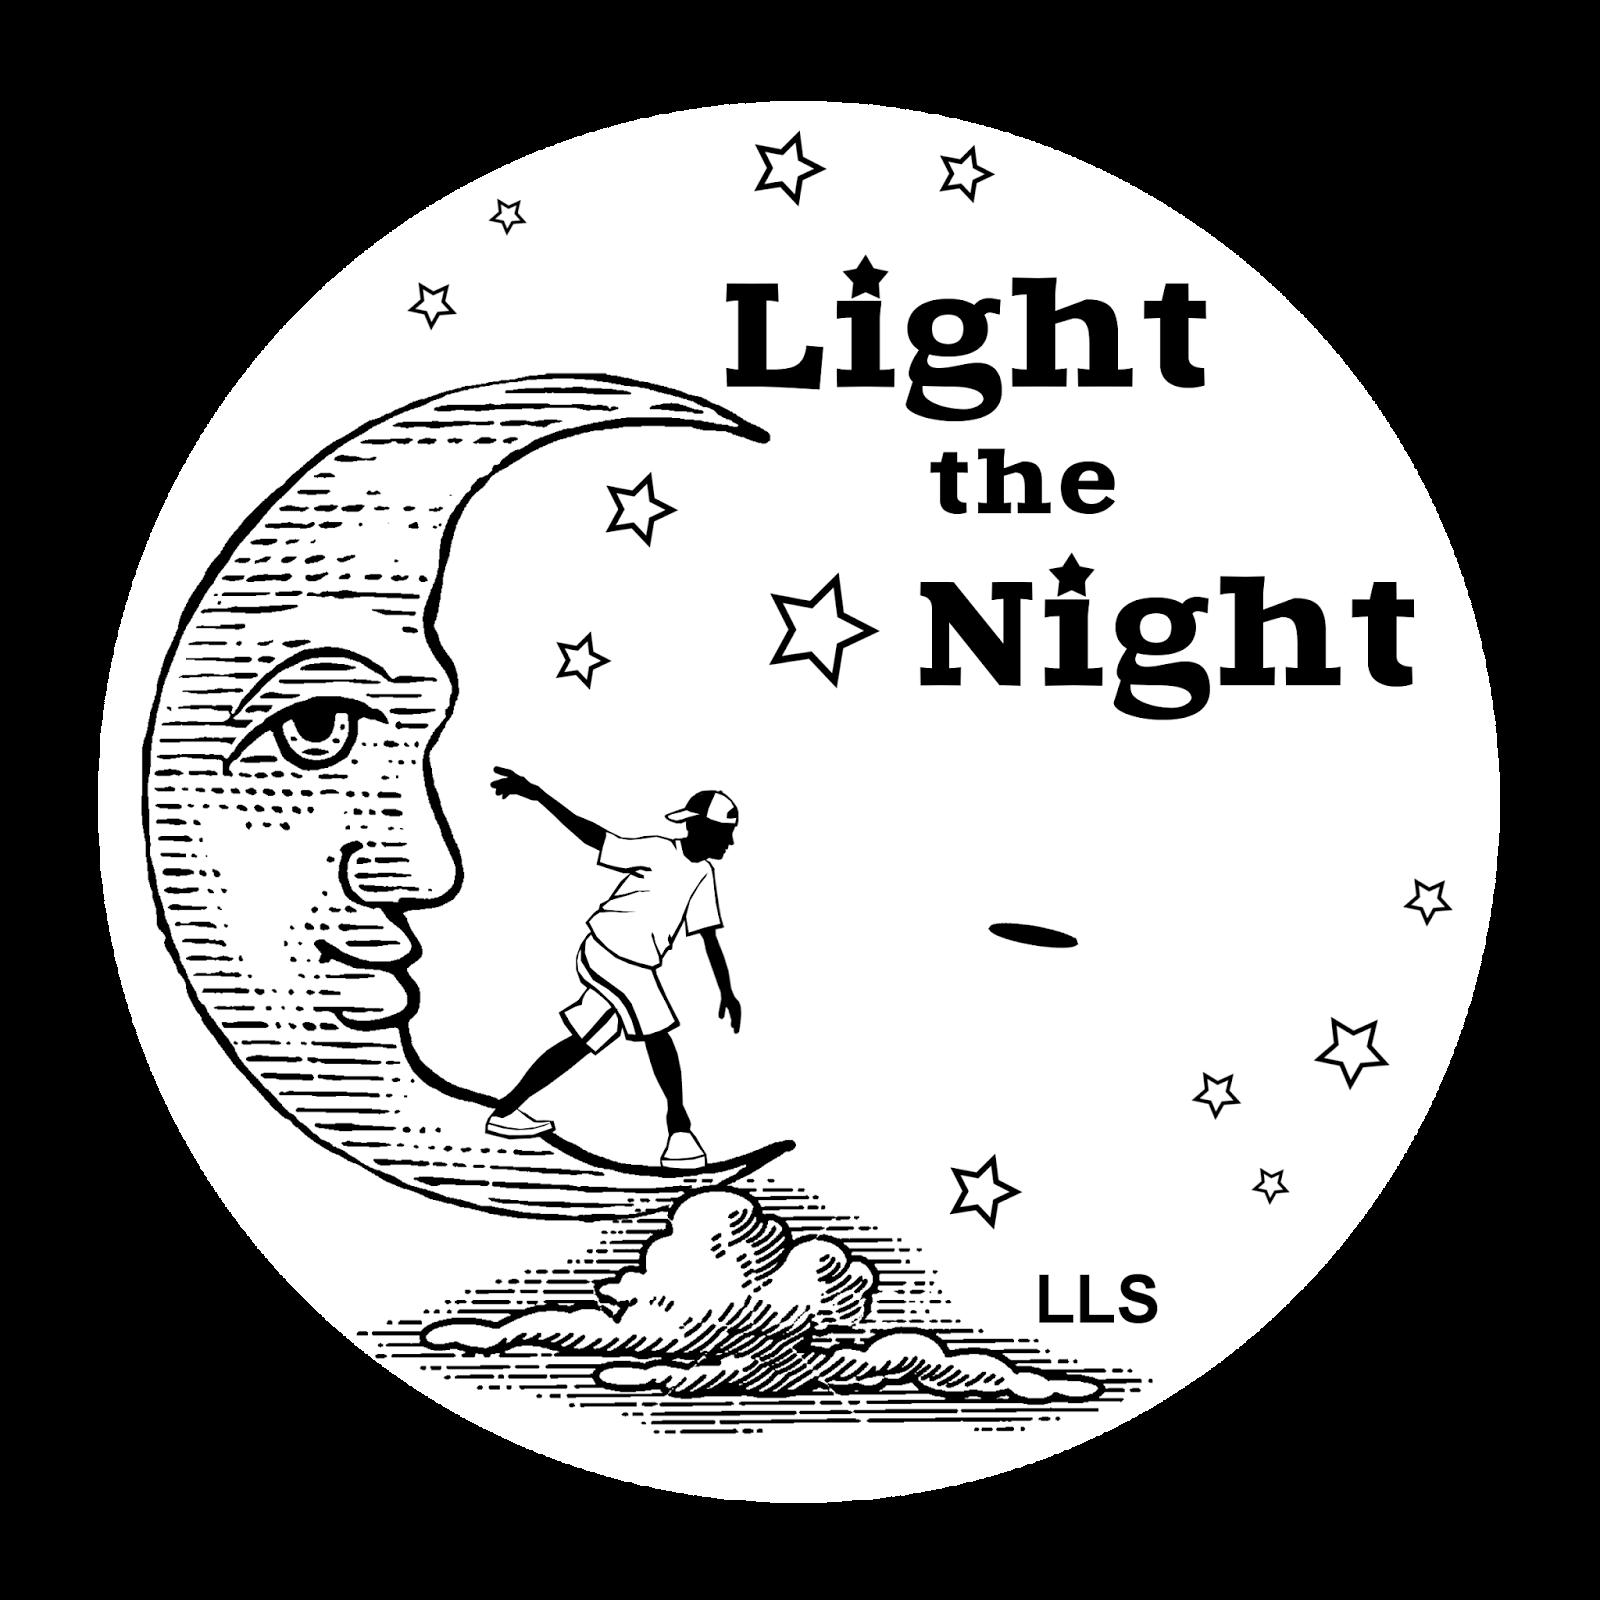 craftasaurus-rex: Light the Night Team BodhiLove graphics